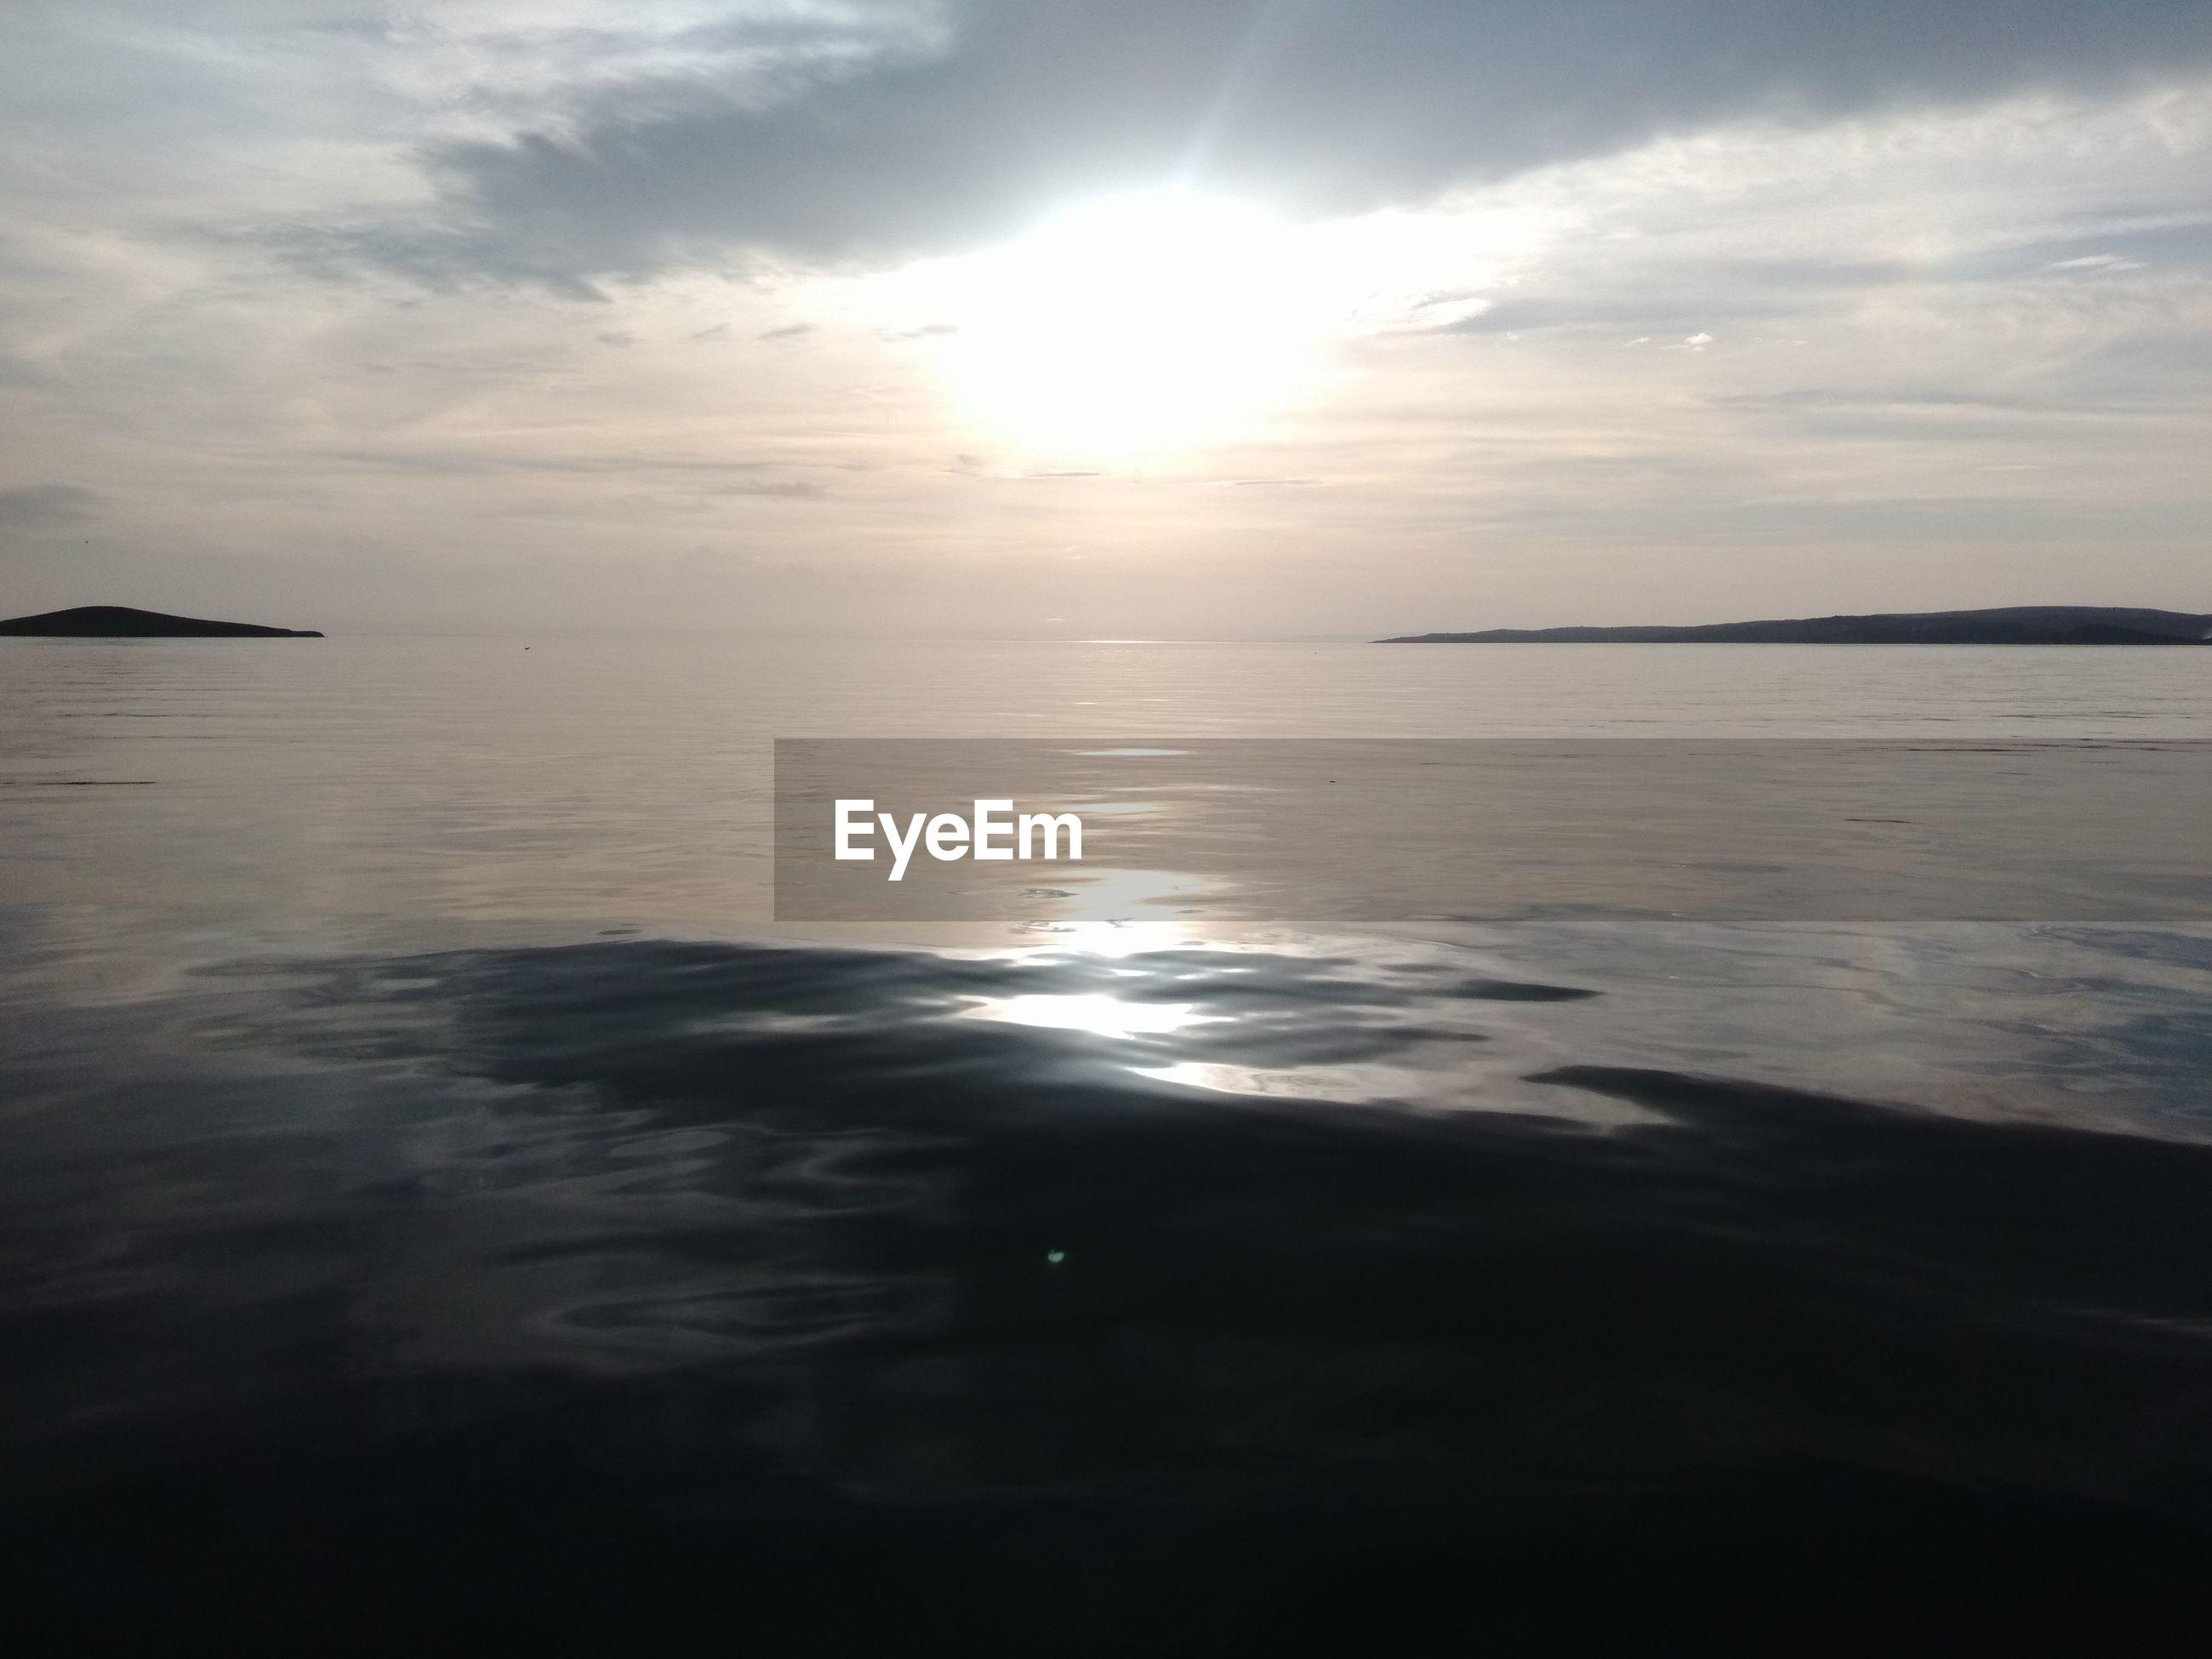 water, sea, tranquil scene, sky, reflection, scenics, tranquility, sun, beauty in nature, horizon over water, sunset, nature, waterfront, sunlight, cloud - sky, idyllic, sunbeam, rippled, cloud, seascape